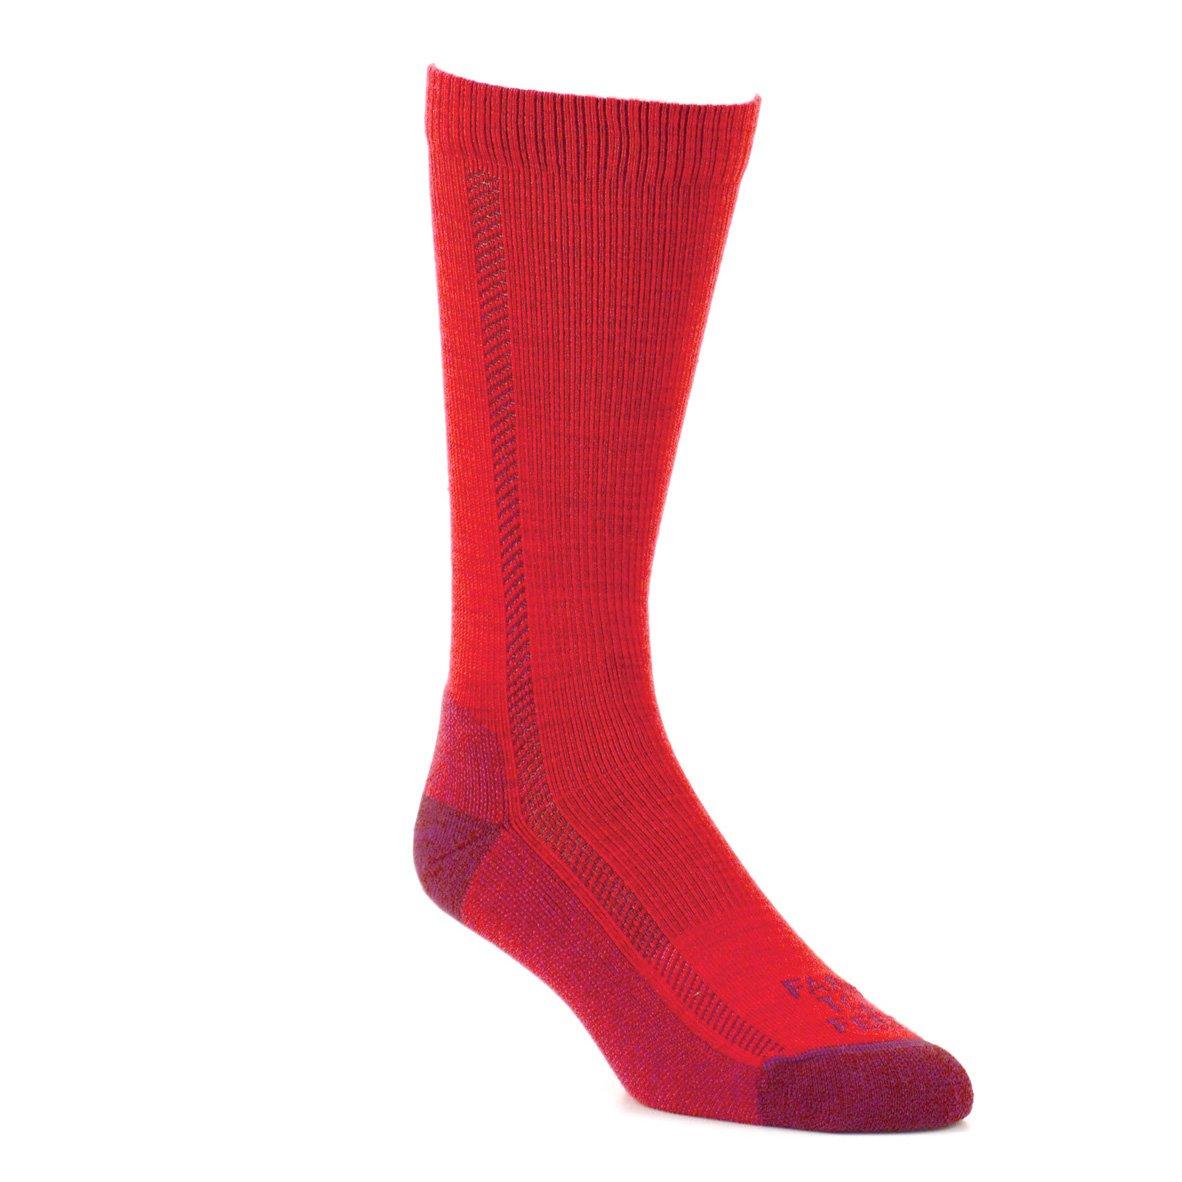 Farm to Feet Madison Lightweight Hiking Crew Socks, Virtual Pink, Medium by Farm to Feet